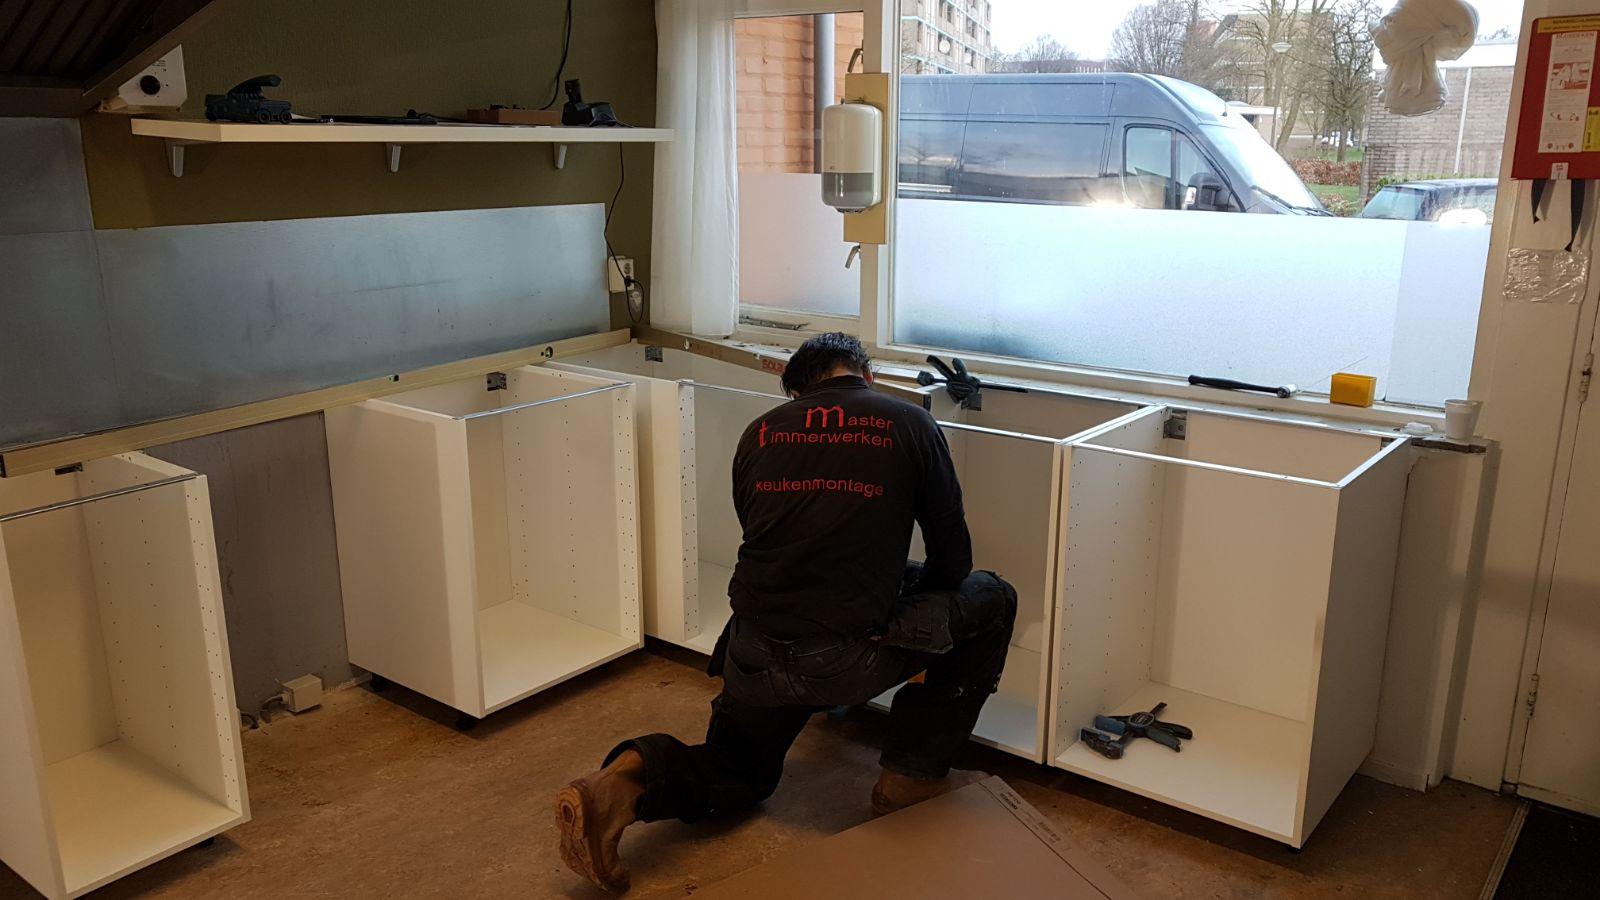 keukenmontage-almere-project71